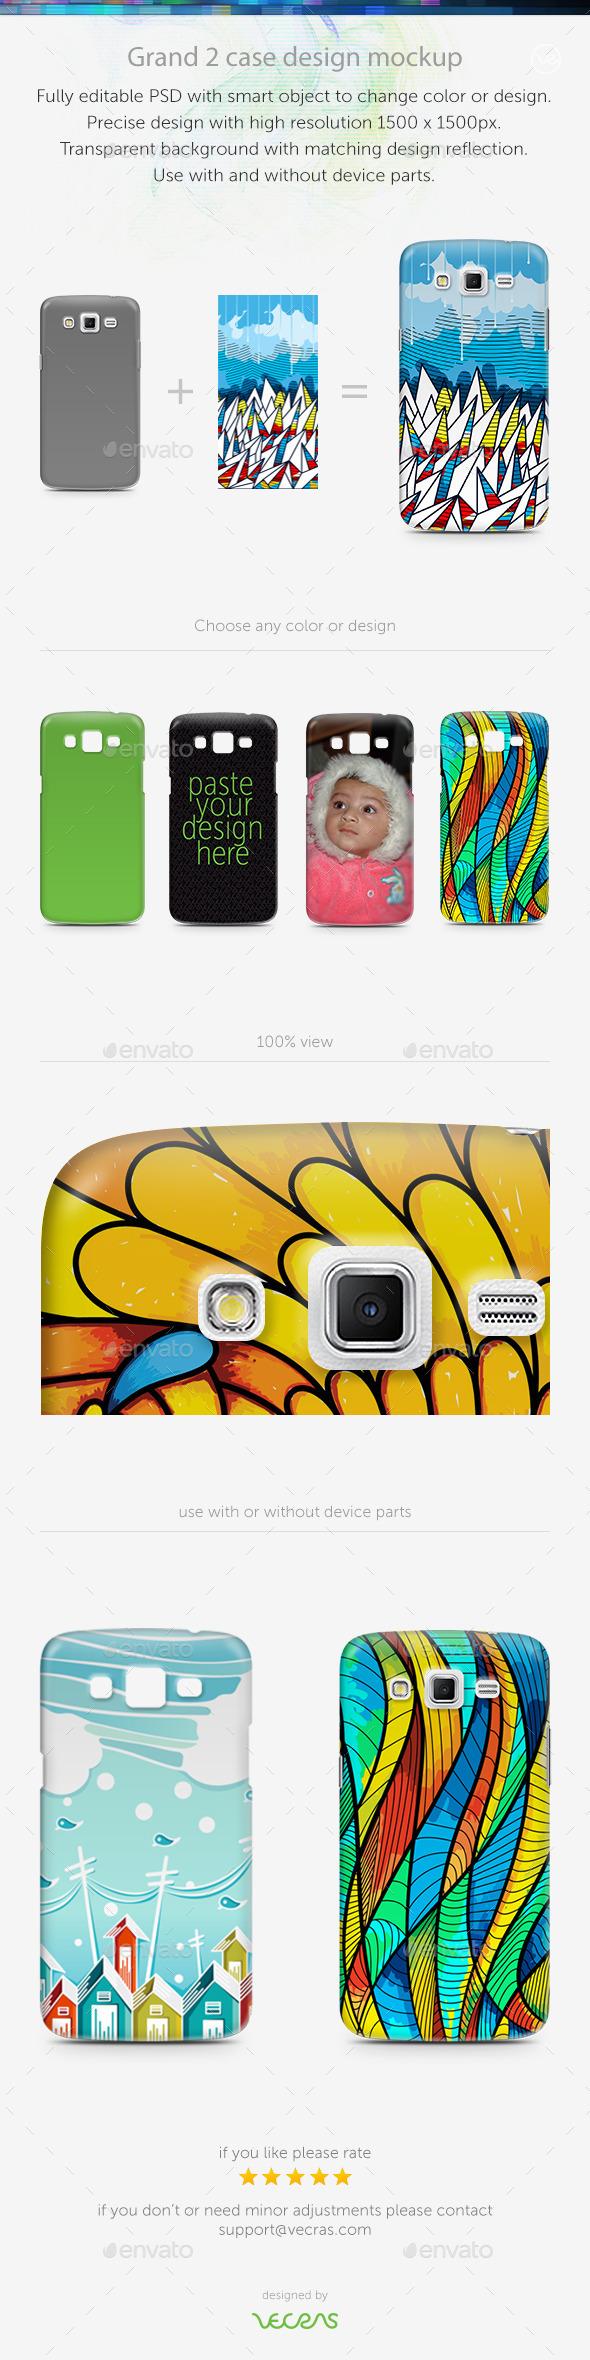 Grand 2 Case Design Mockup